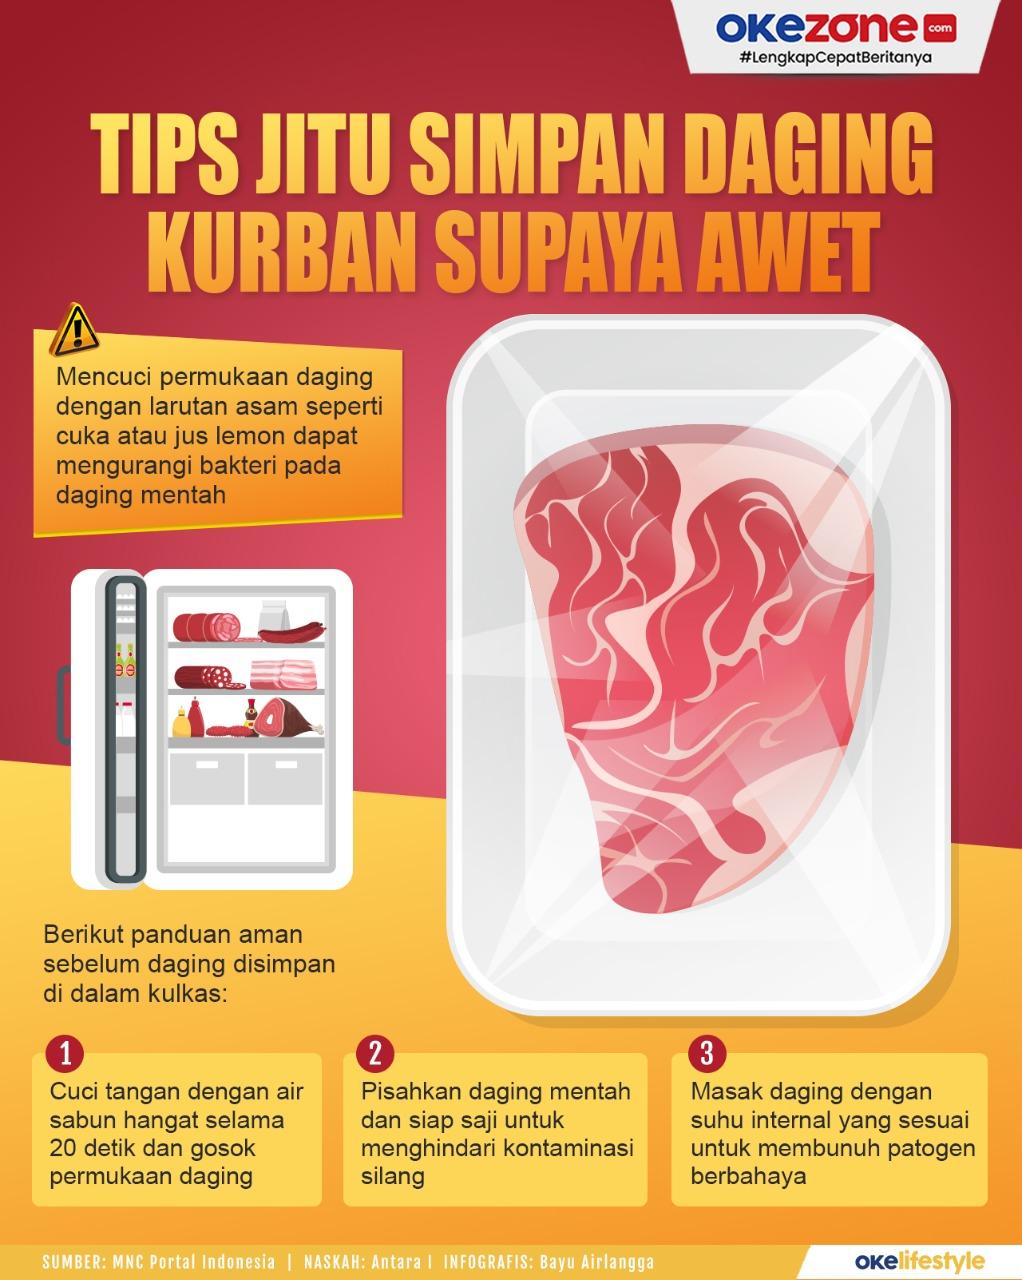 Tips Jitu Simpan Daging Kurban supaya Awet -